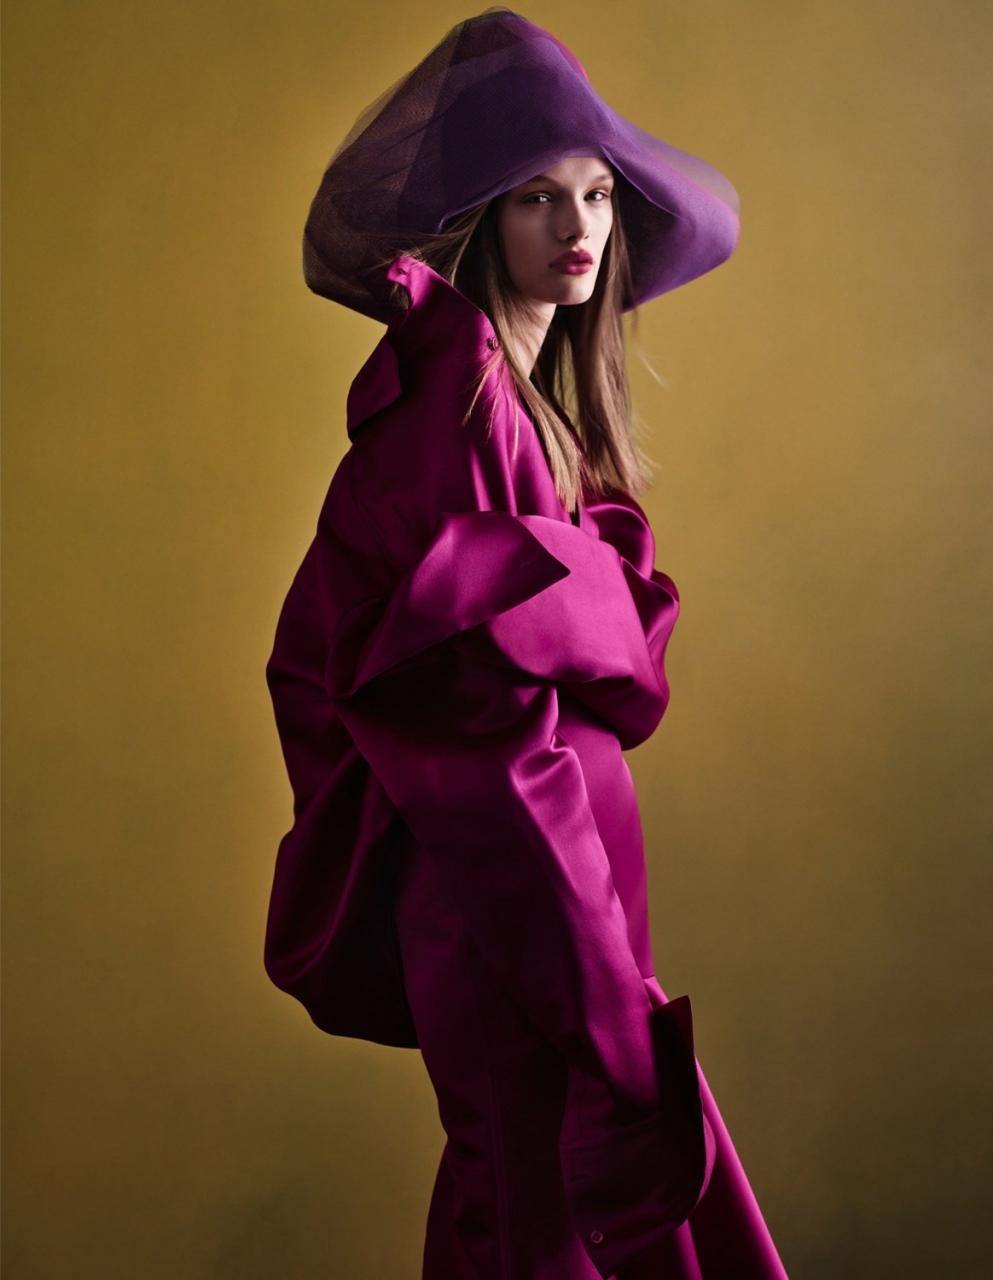 《VOGUE》中国版2019年1月刊 超模Kris Grikaite出镜 时尚图库 第6张